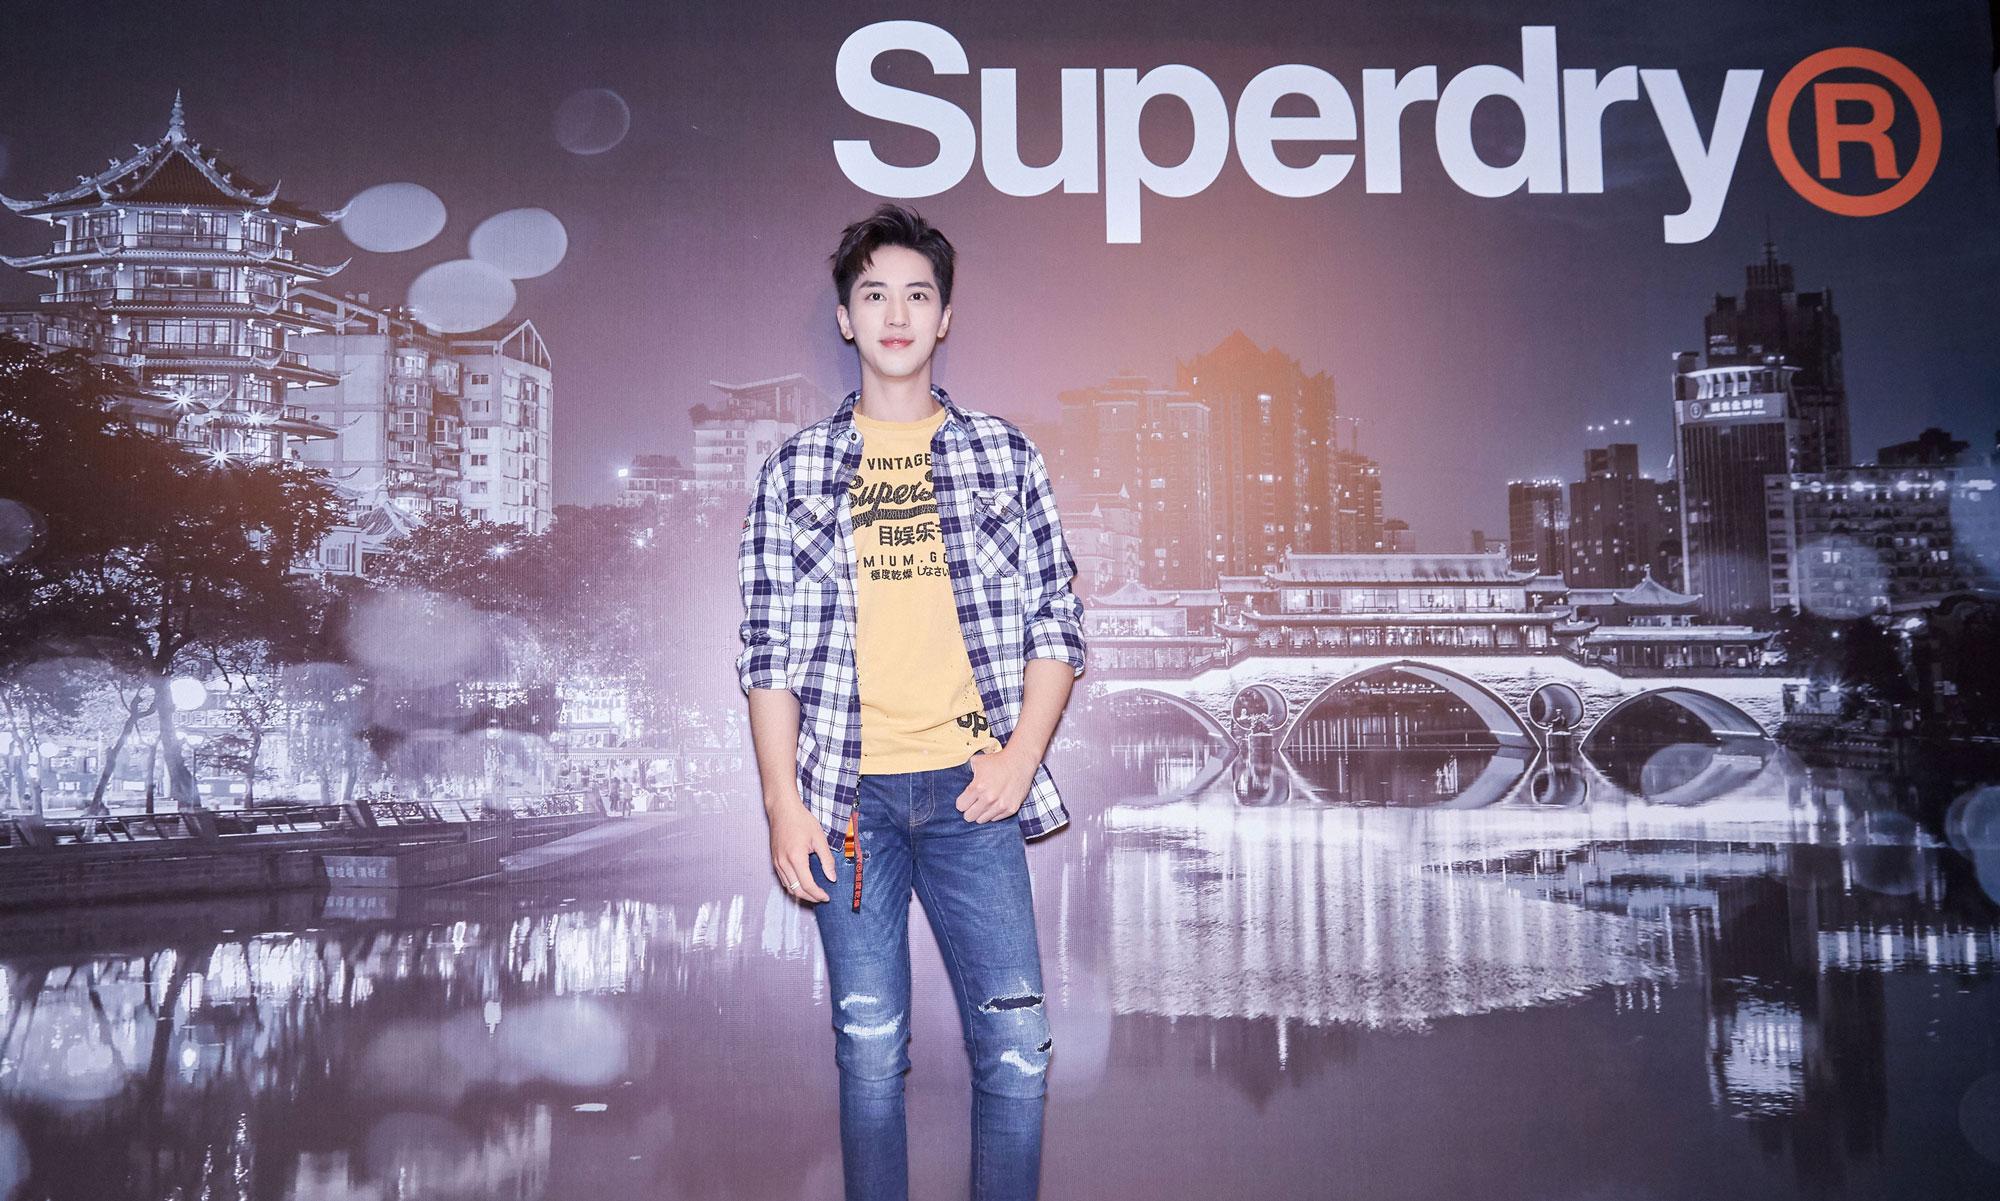 Superdry 携手许魏洲发布《Super 敢燥》微电影